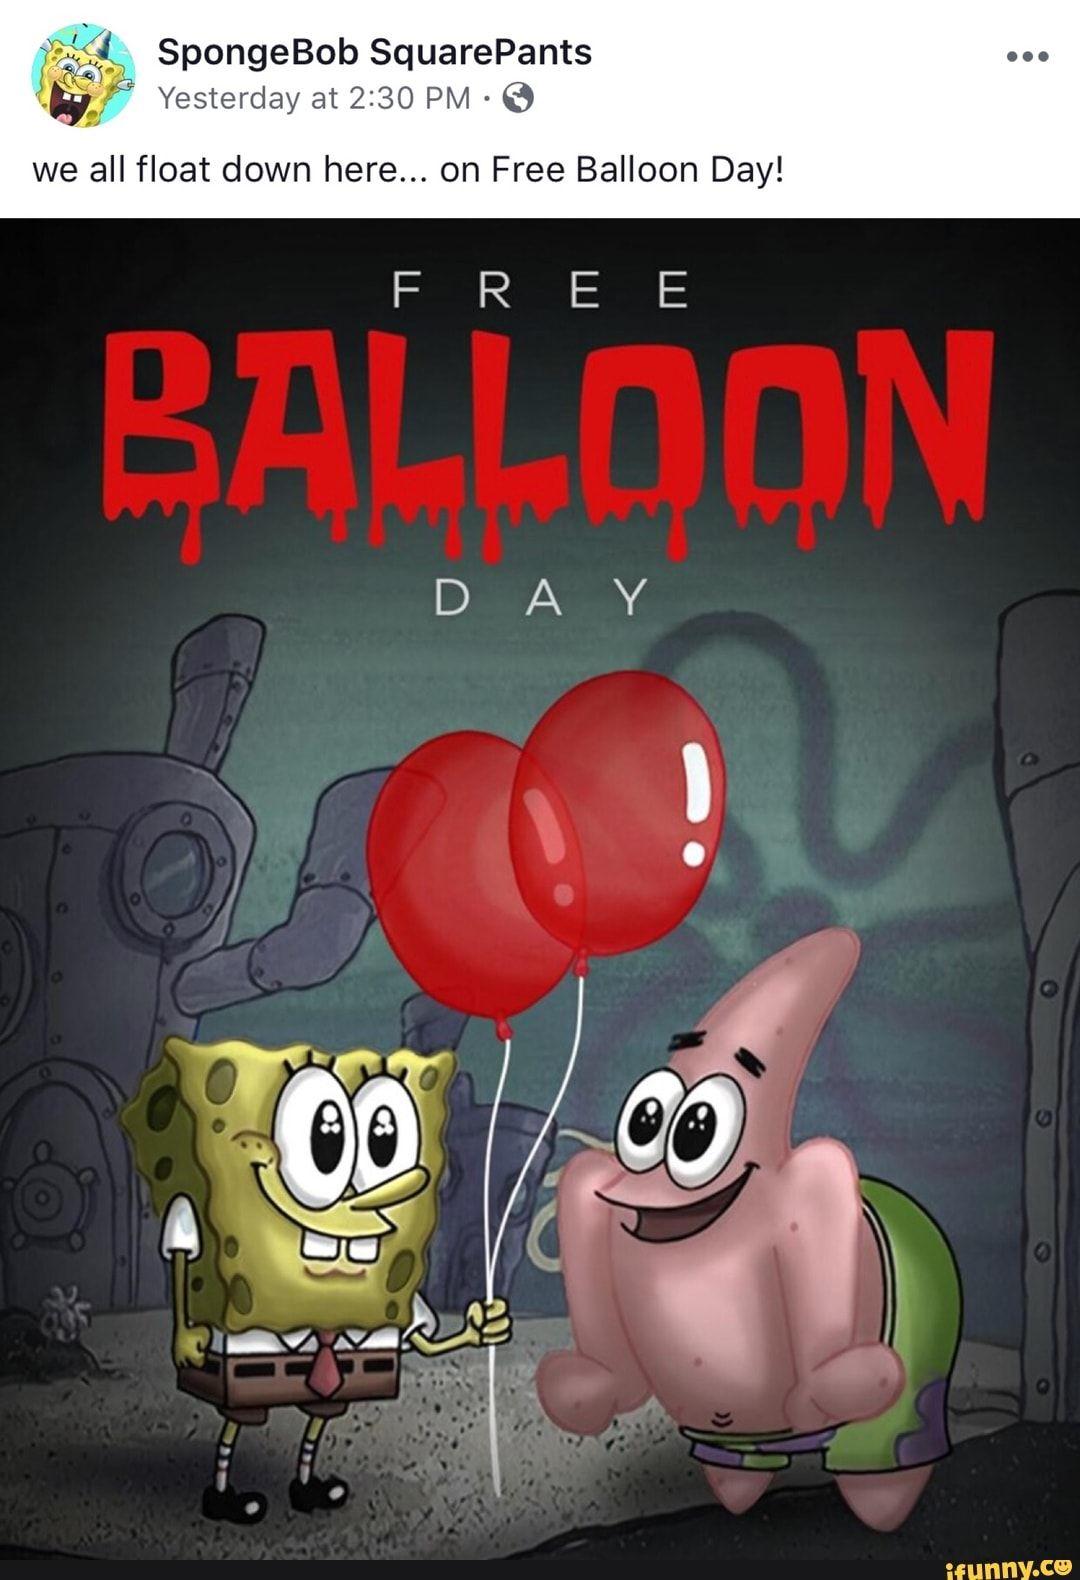 SpongeBob SquarePants Yesterday at 2:30 PM - 6 we all ...